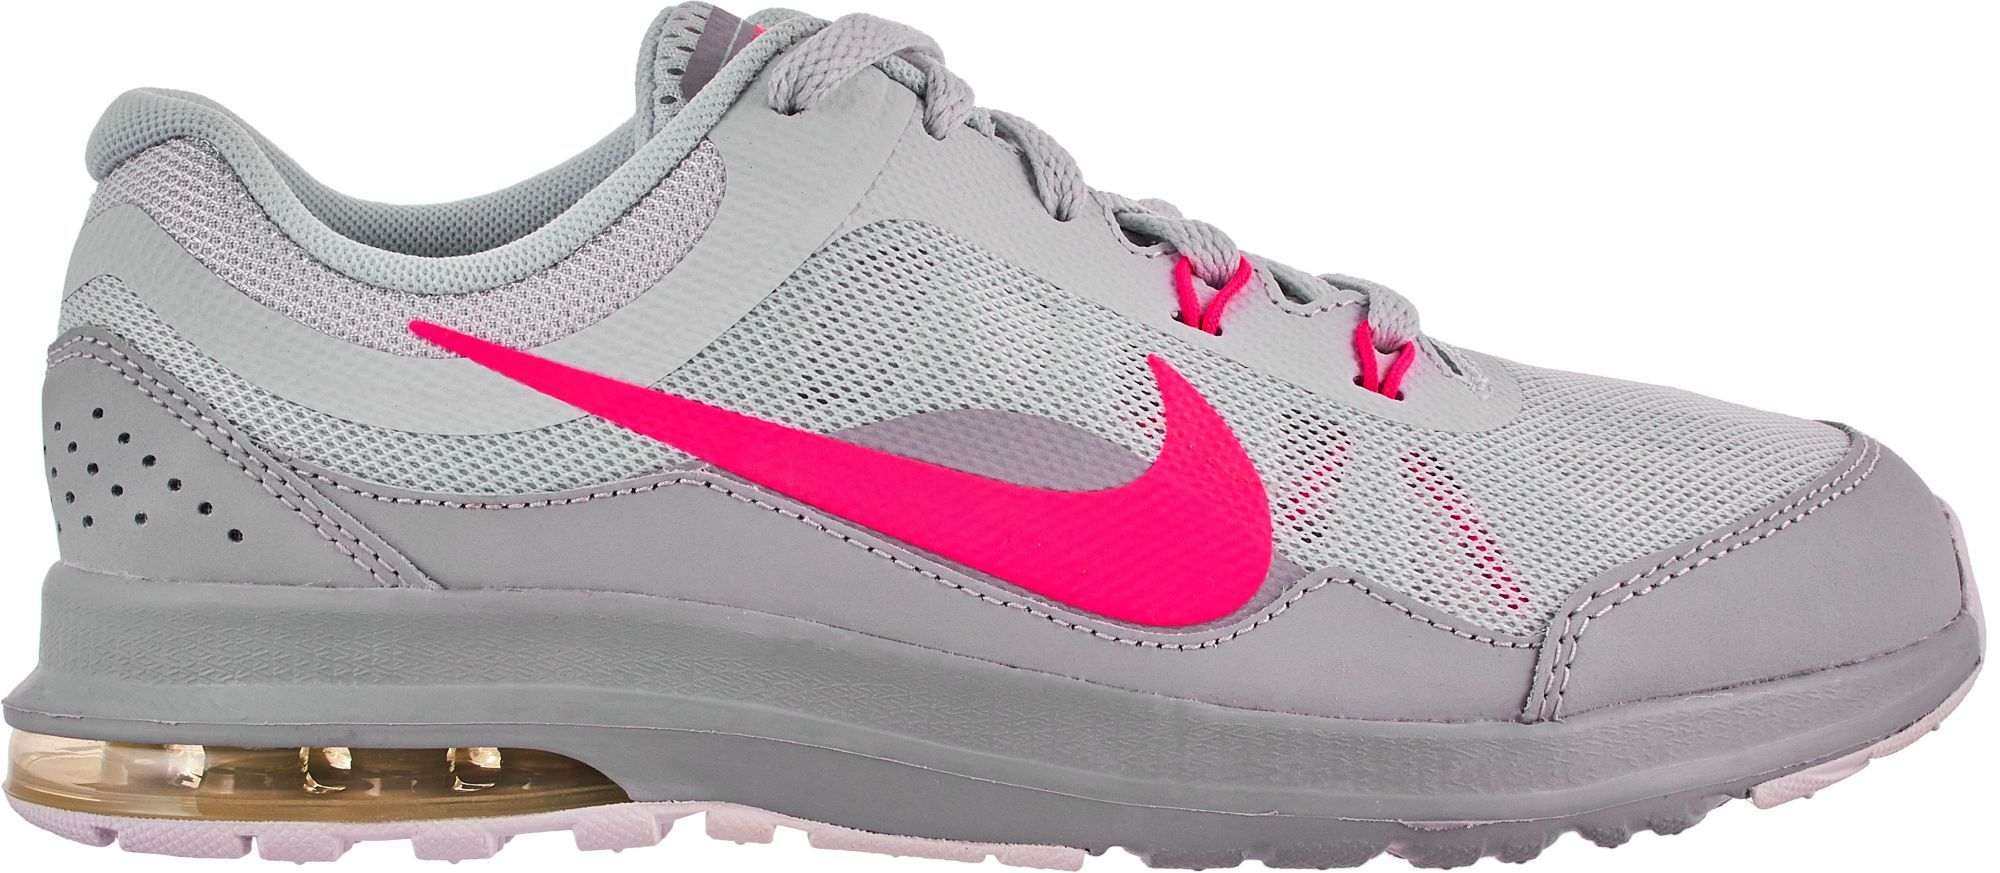 Max Boy's Preschool Size Running Nike Air 2 Dynasty Kids' Shoes wAnx8qt